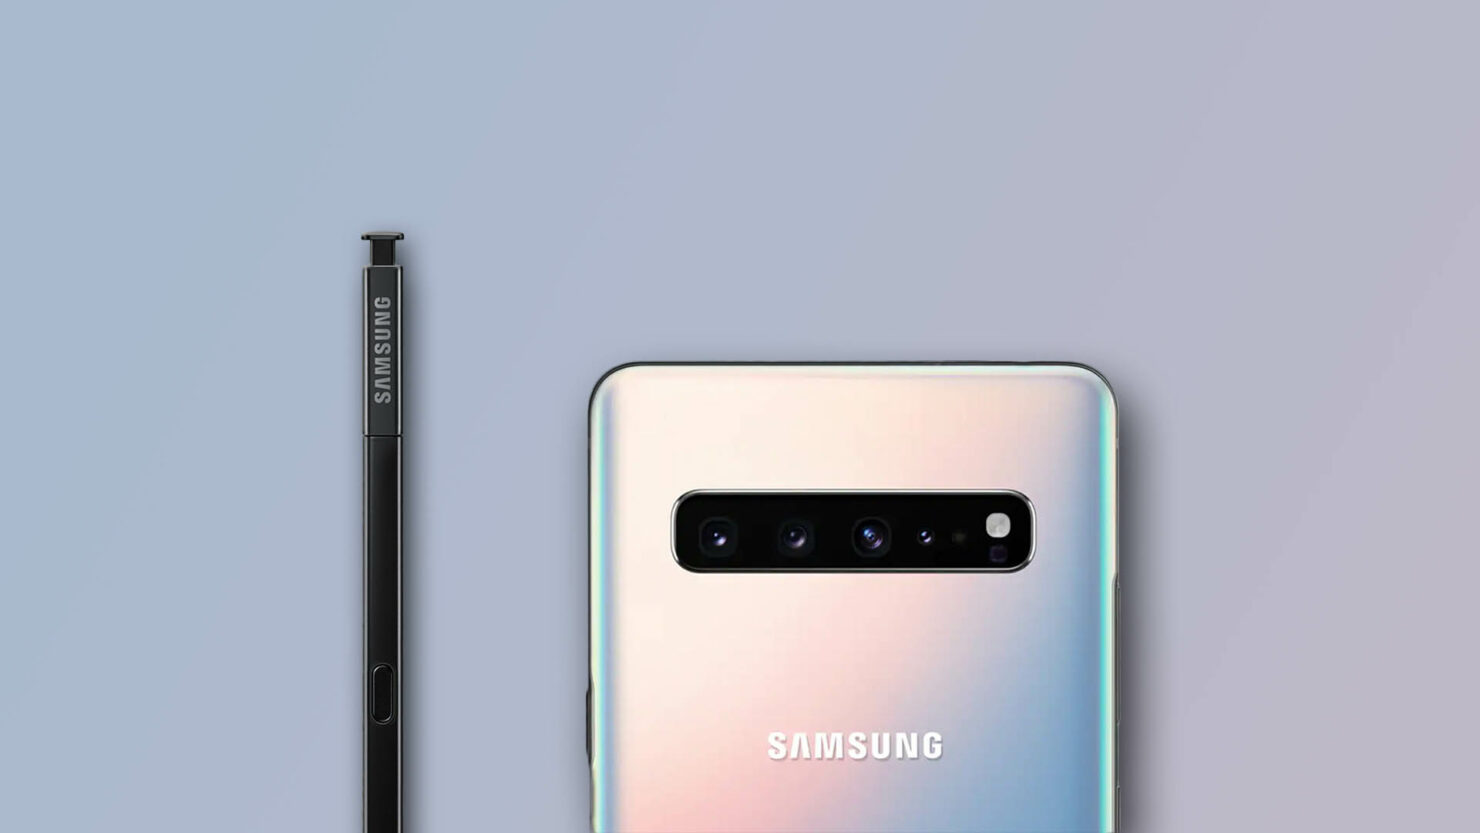 Galaxy Note 10 camera DepthVision Lens trademark filed by Samsung